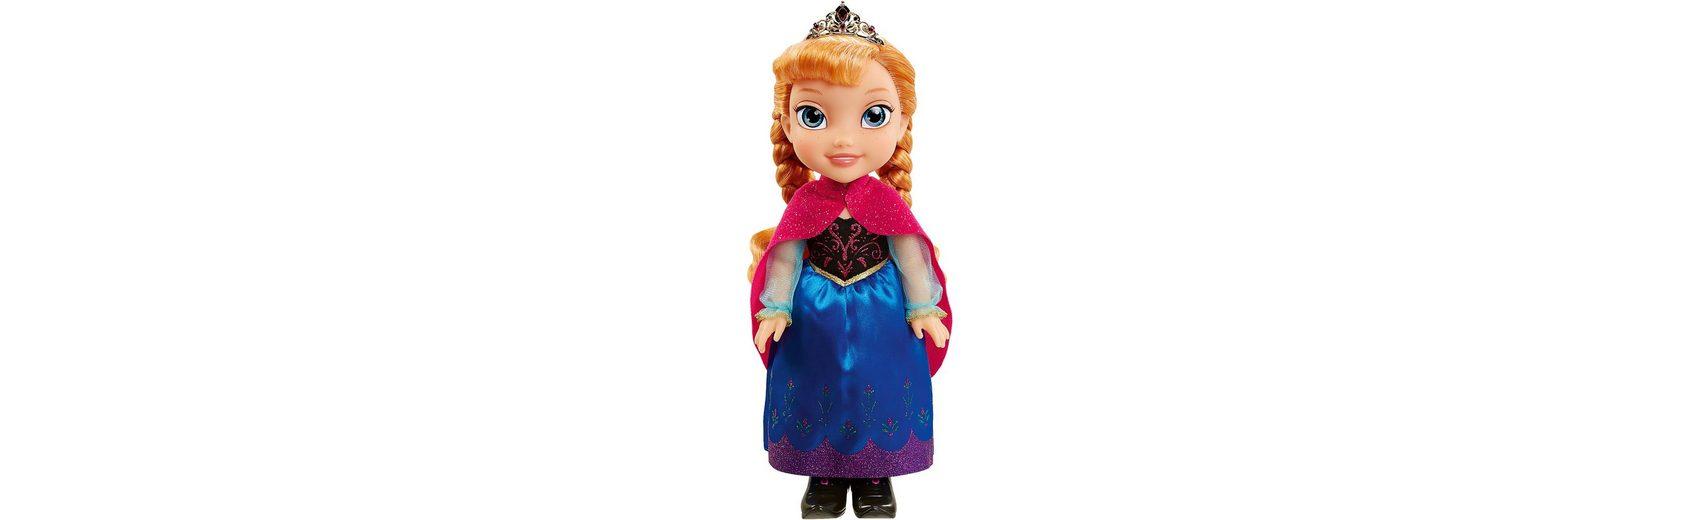 Jakks Pacific Disney Frozen Anna Puppe Winter Cape, 35 cm